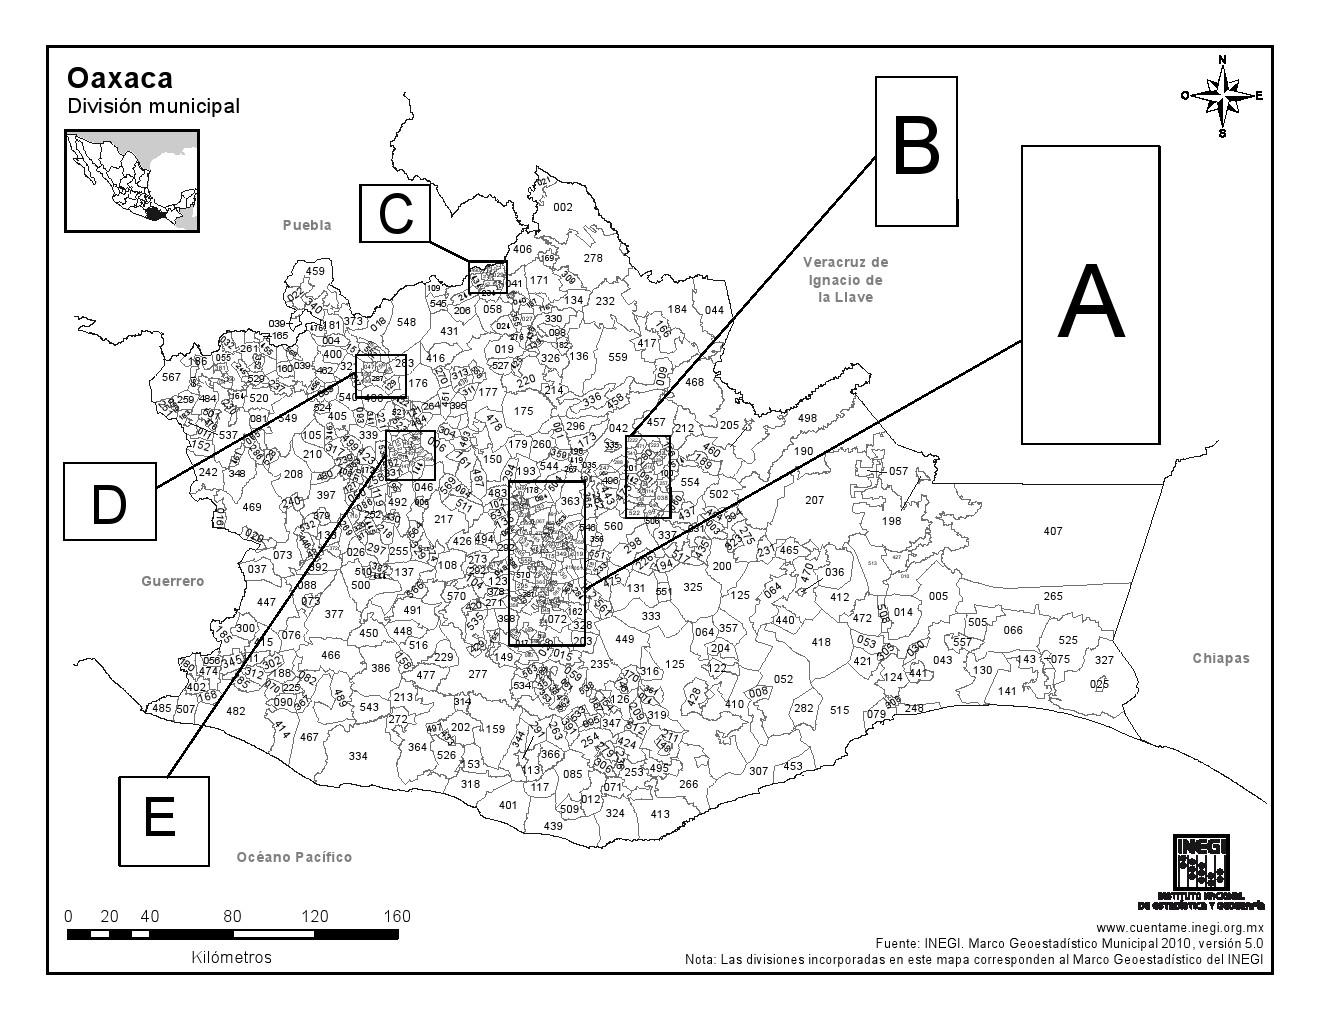 Mapa de municipios de Oaxaca. INEGI de México